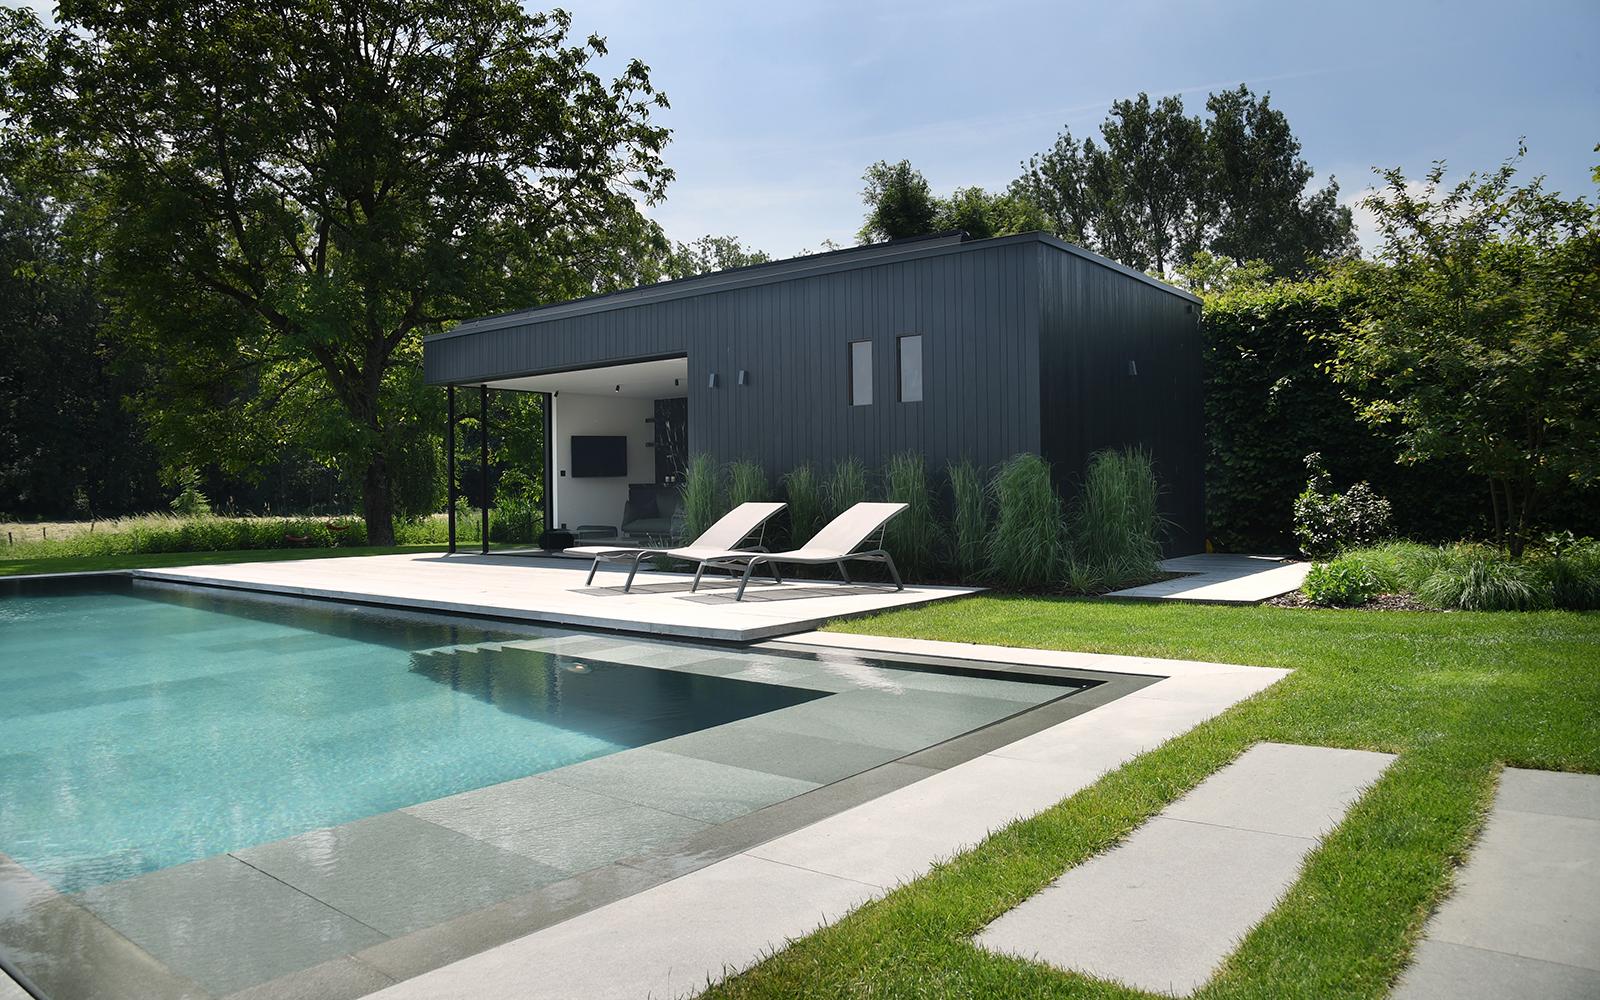 Strakke tuin, Willy Naessens, zwembad, buitenzwembad, The Art Of Living